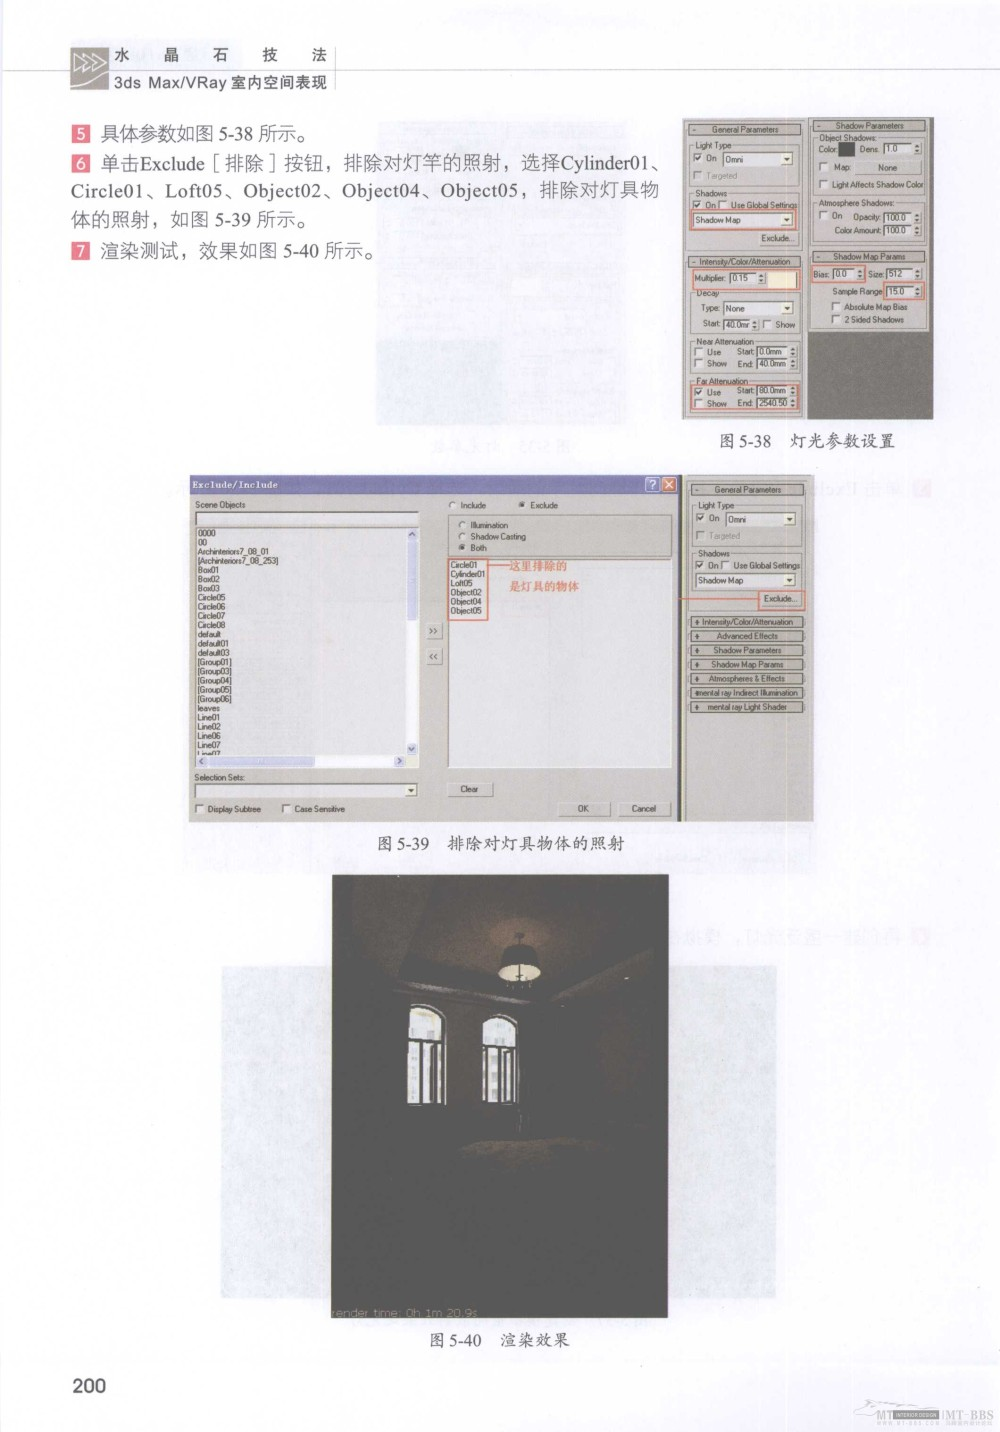 水晶石技法-3ds_Max&VRay室内空间表现_水晶石技法-3ds_Max&VRay室内空间表现_页面_206.jpg